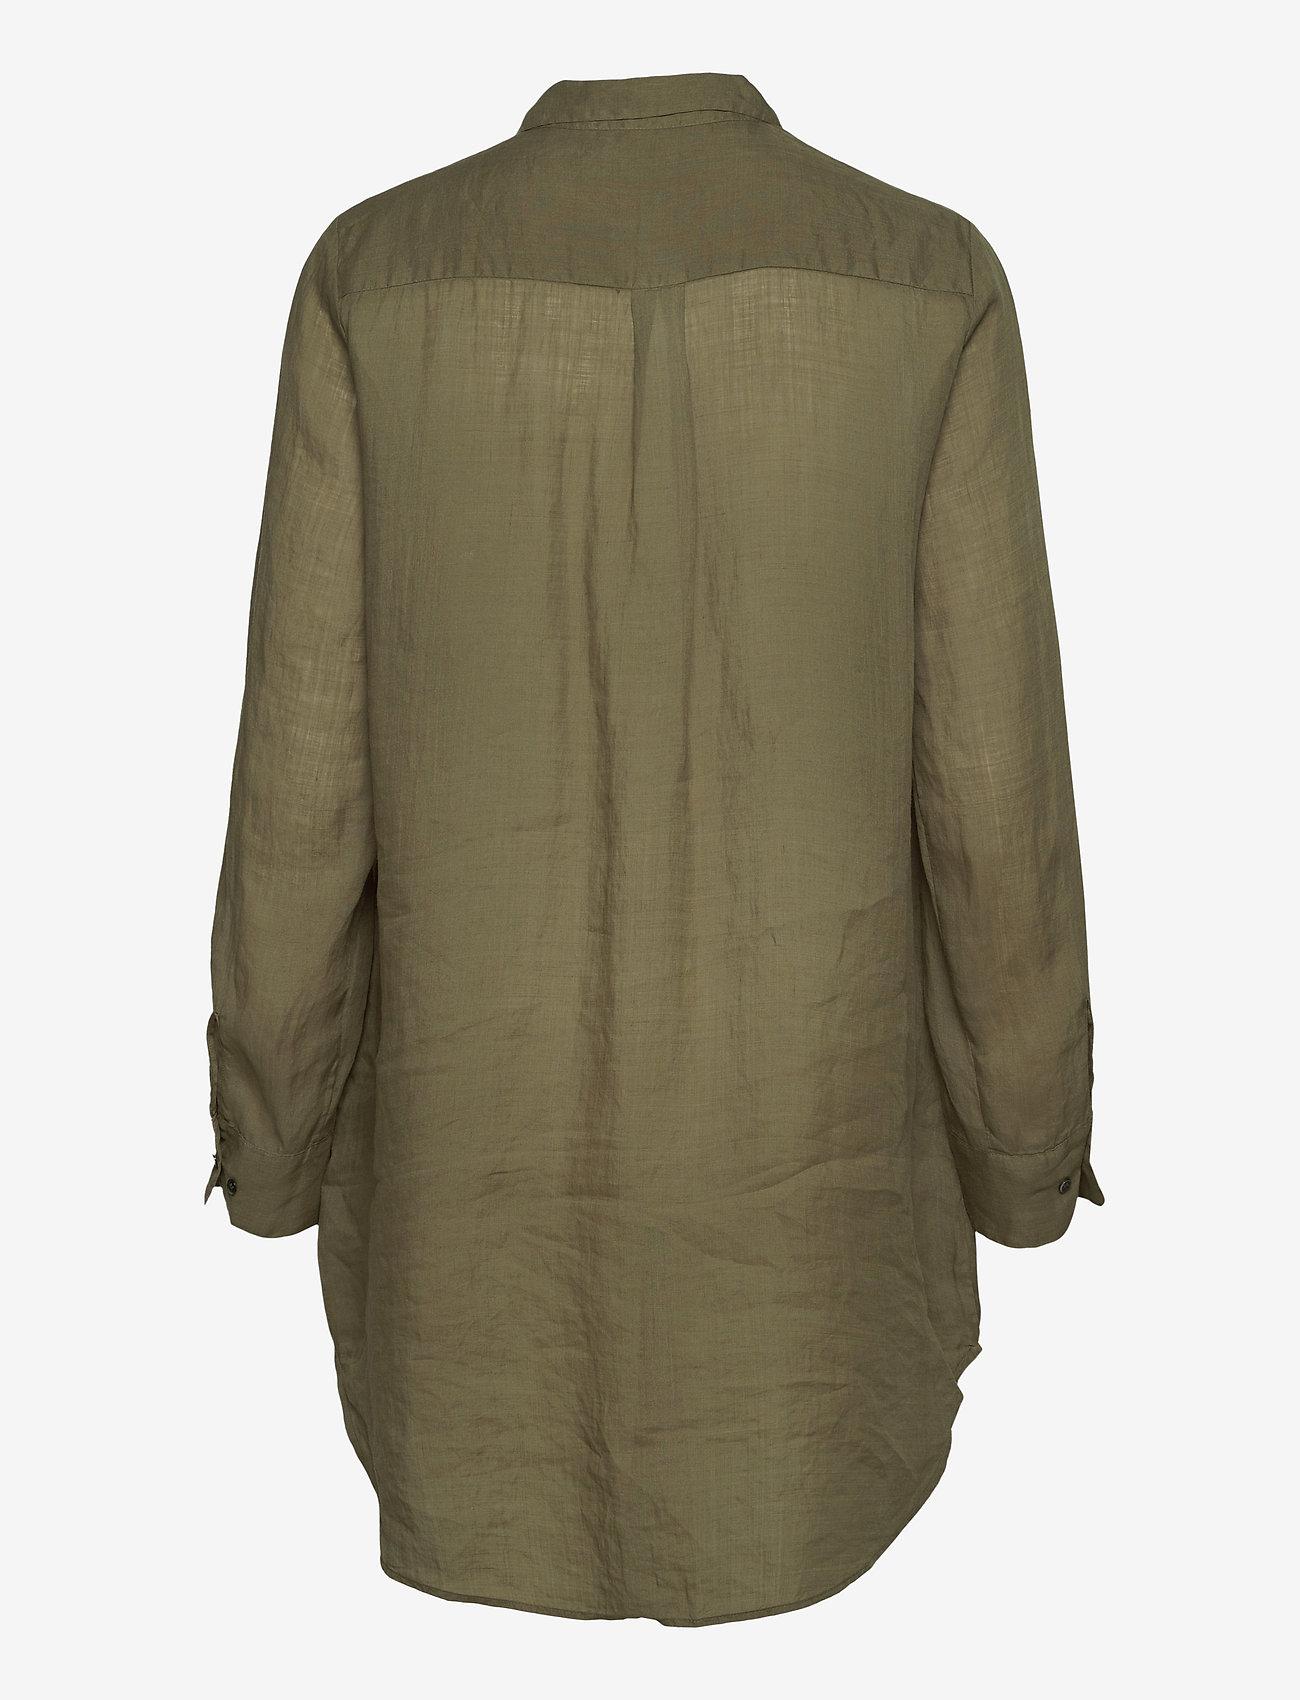 SAND - 8851 - Nami Long CB - tunieken - army green - 1